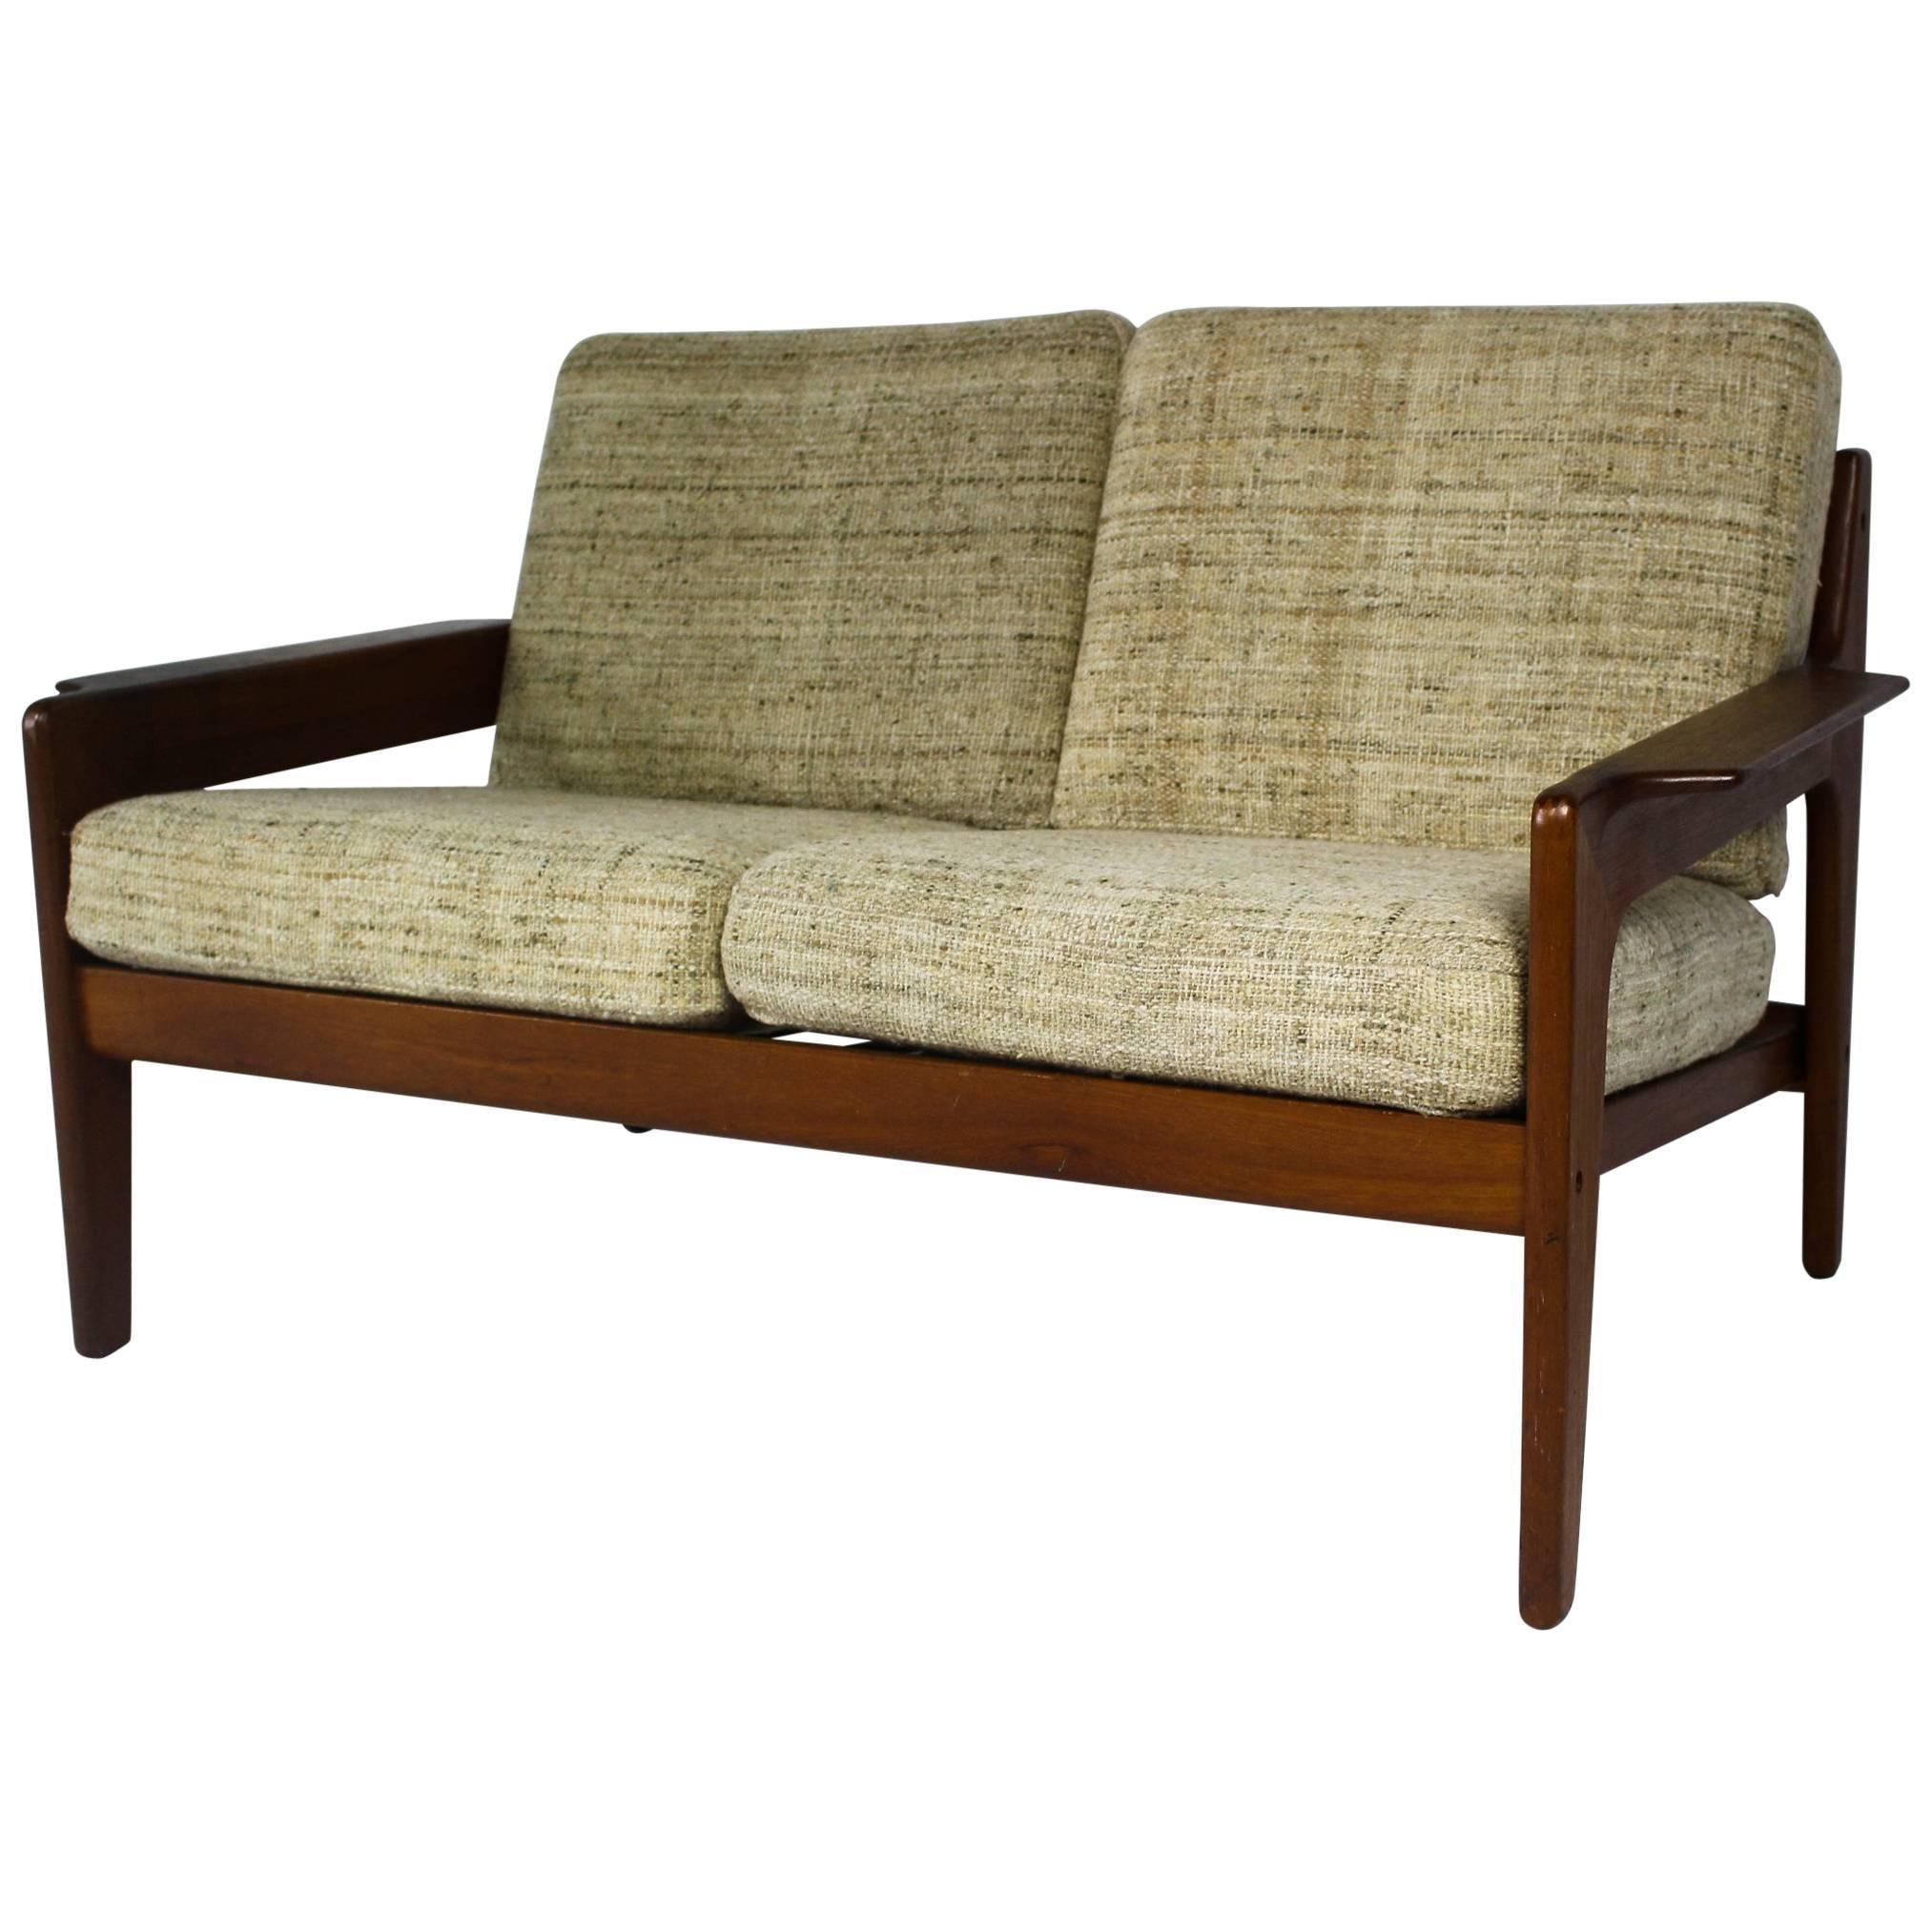 Teak Sofa Teak Sofa Set By Arne Vodder Model 162 Midcentury Teak